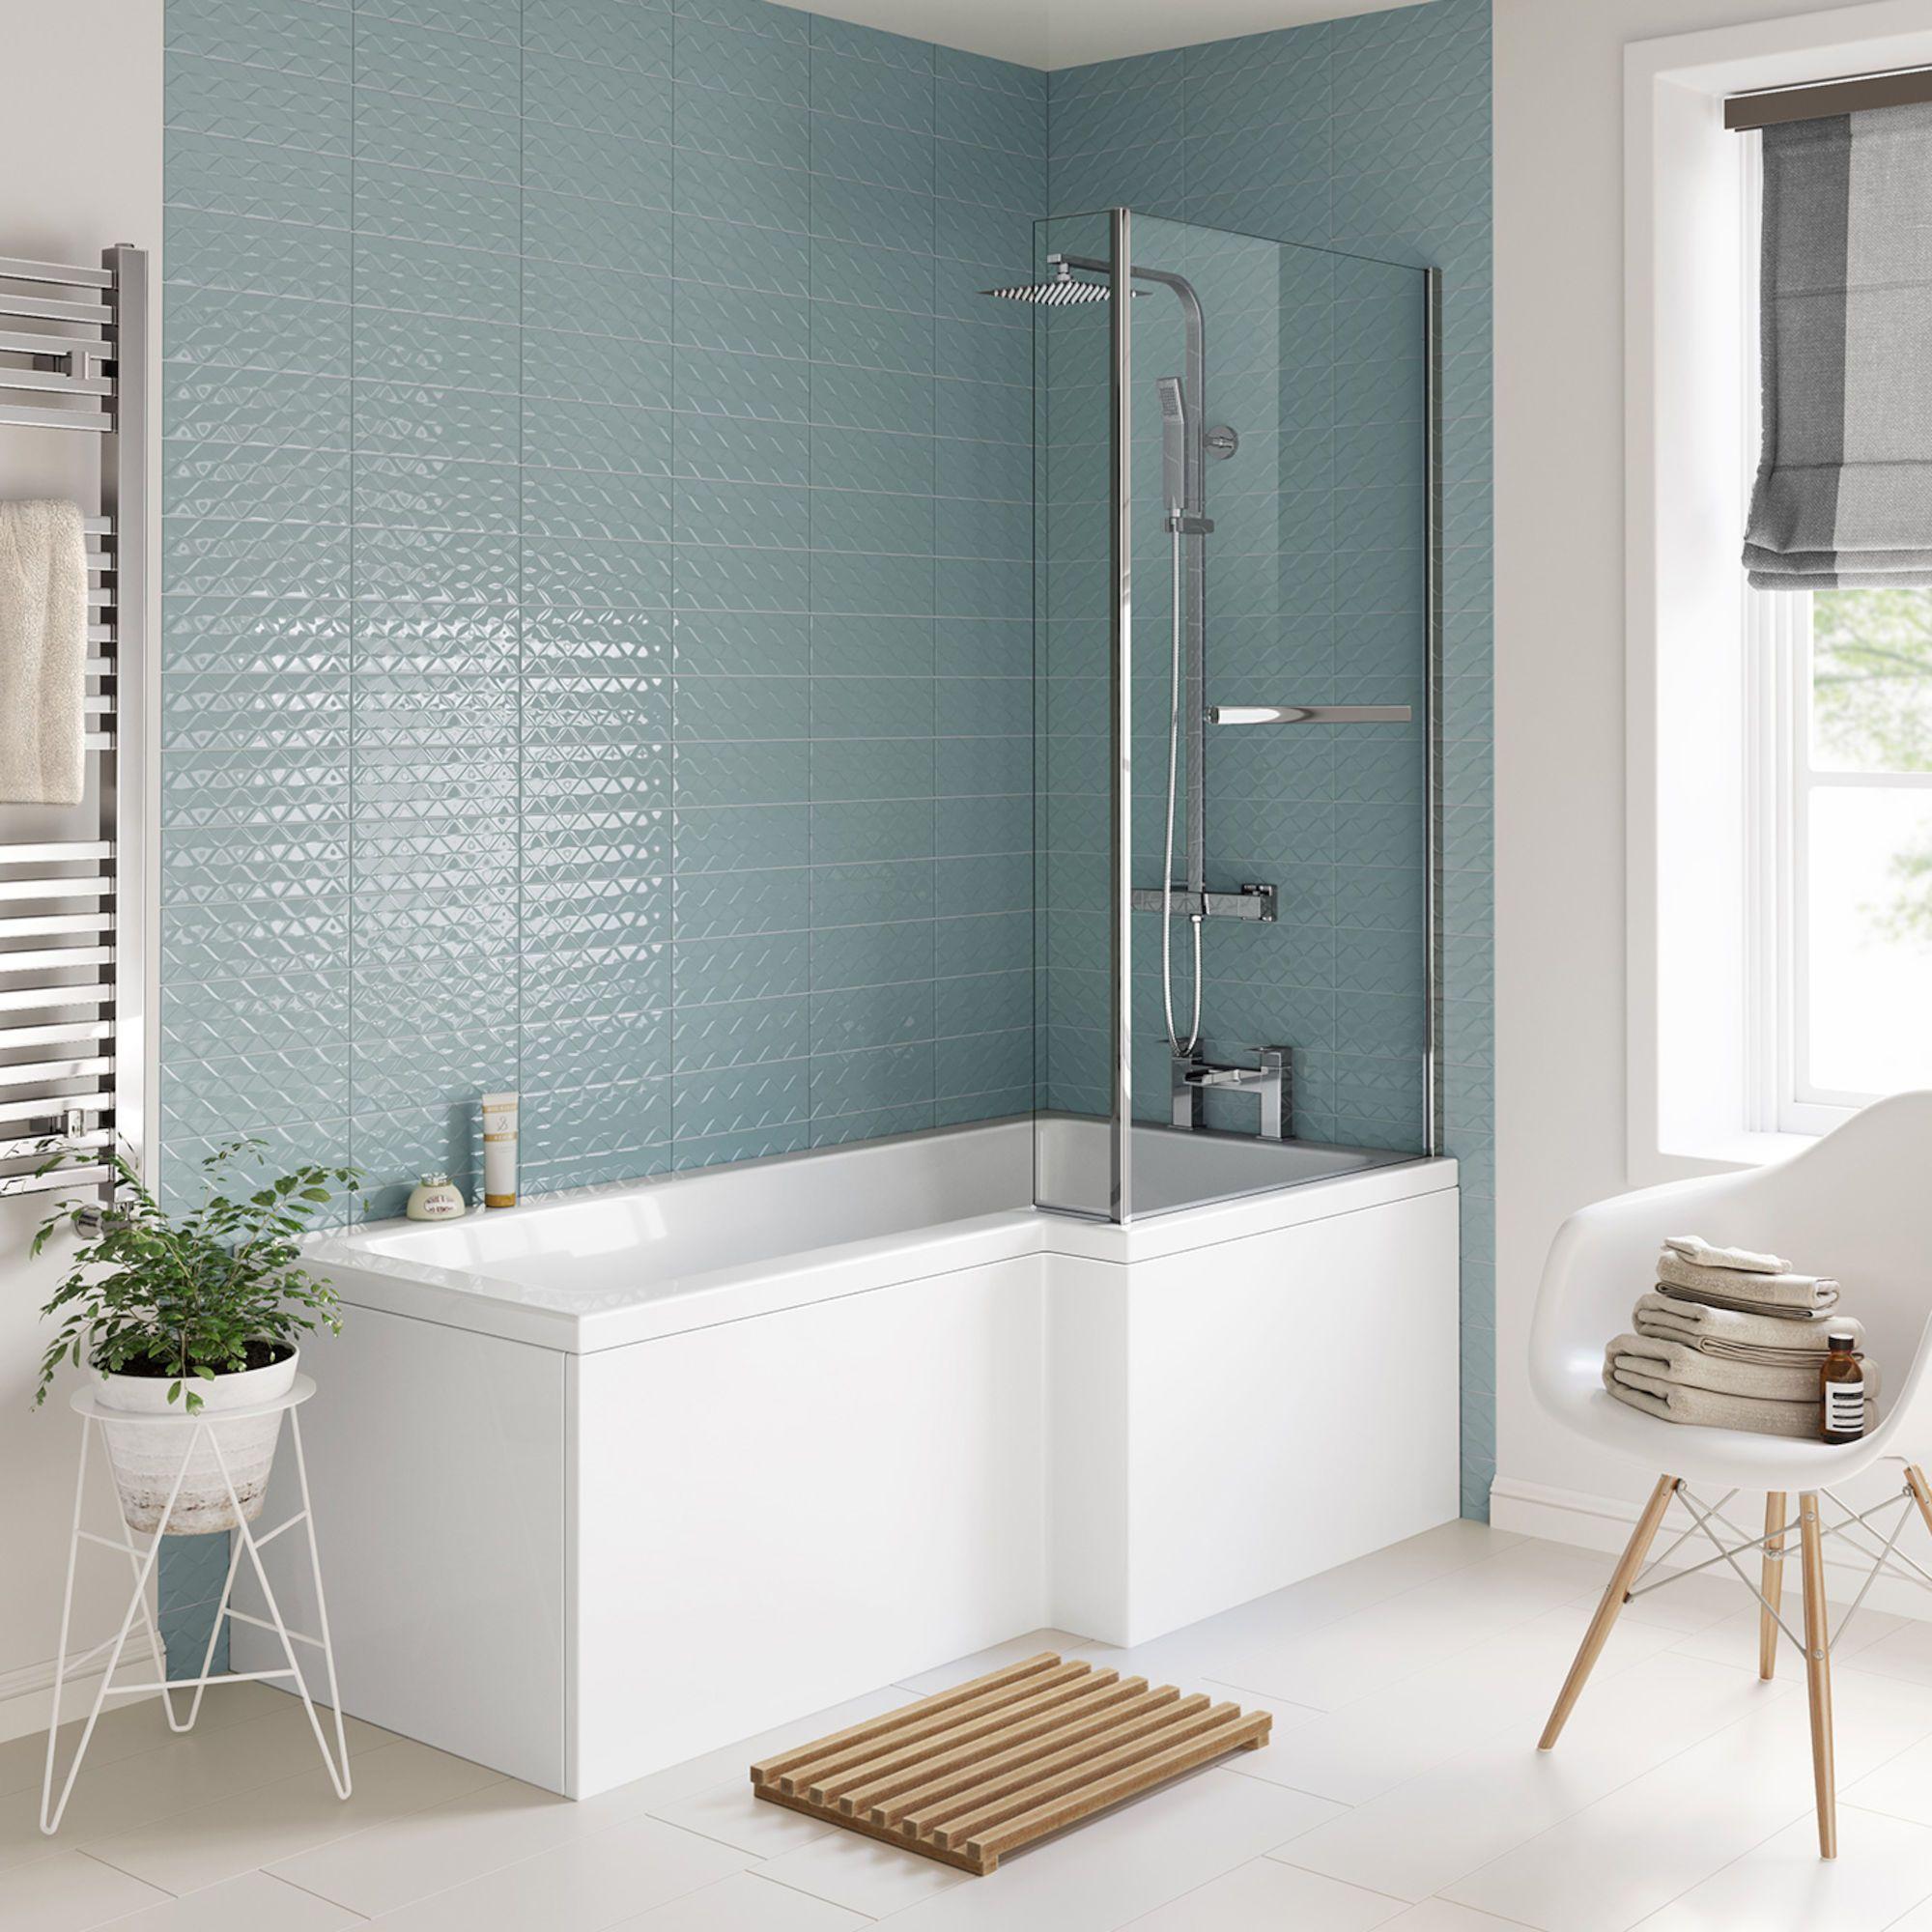 1600mm Right Hand L Shaped Bath With Screen Rail And Panel Soak Com With Images L Shaped Bath Bath Screens L Shaped Bathroom